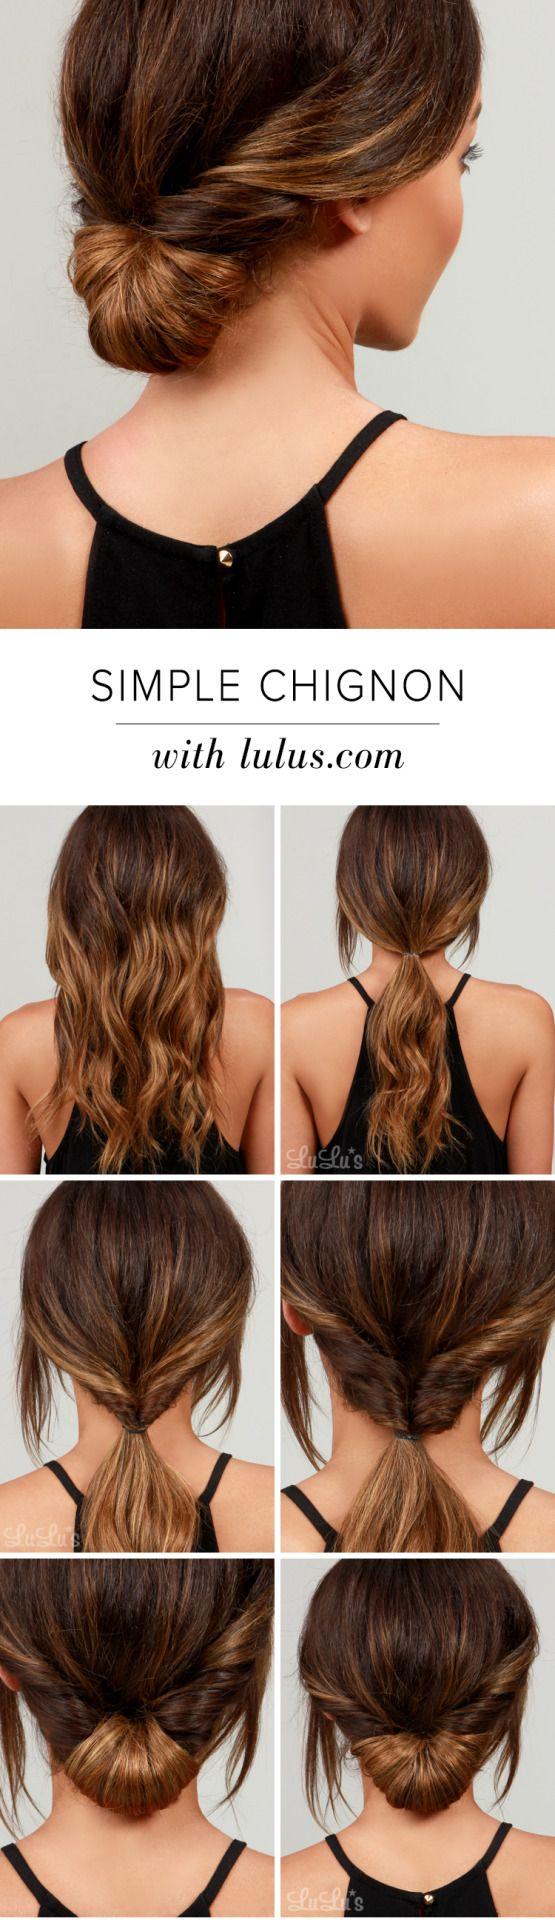 Lulu S How To Simple Chignon Hair Tutorial Hair Styles Long Hair Styles Chignon Hair